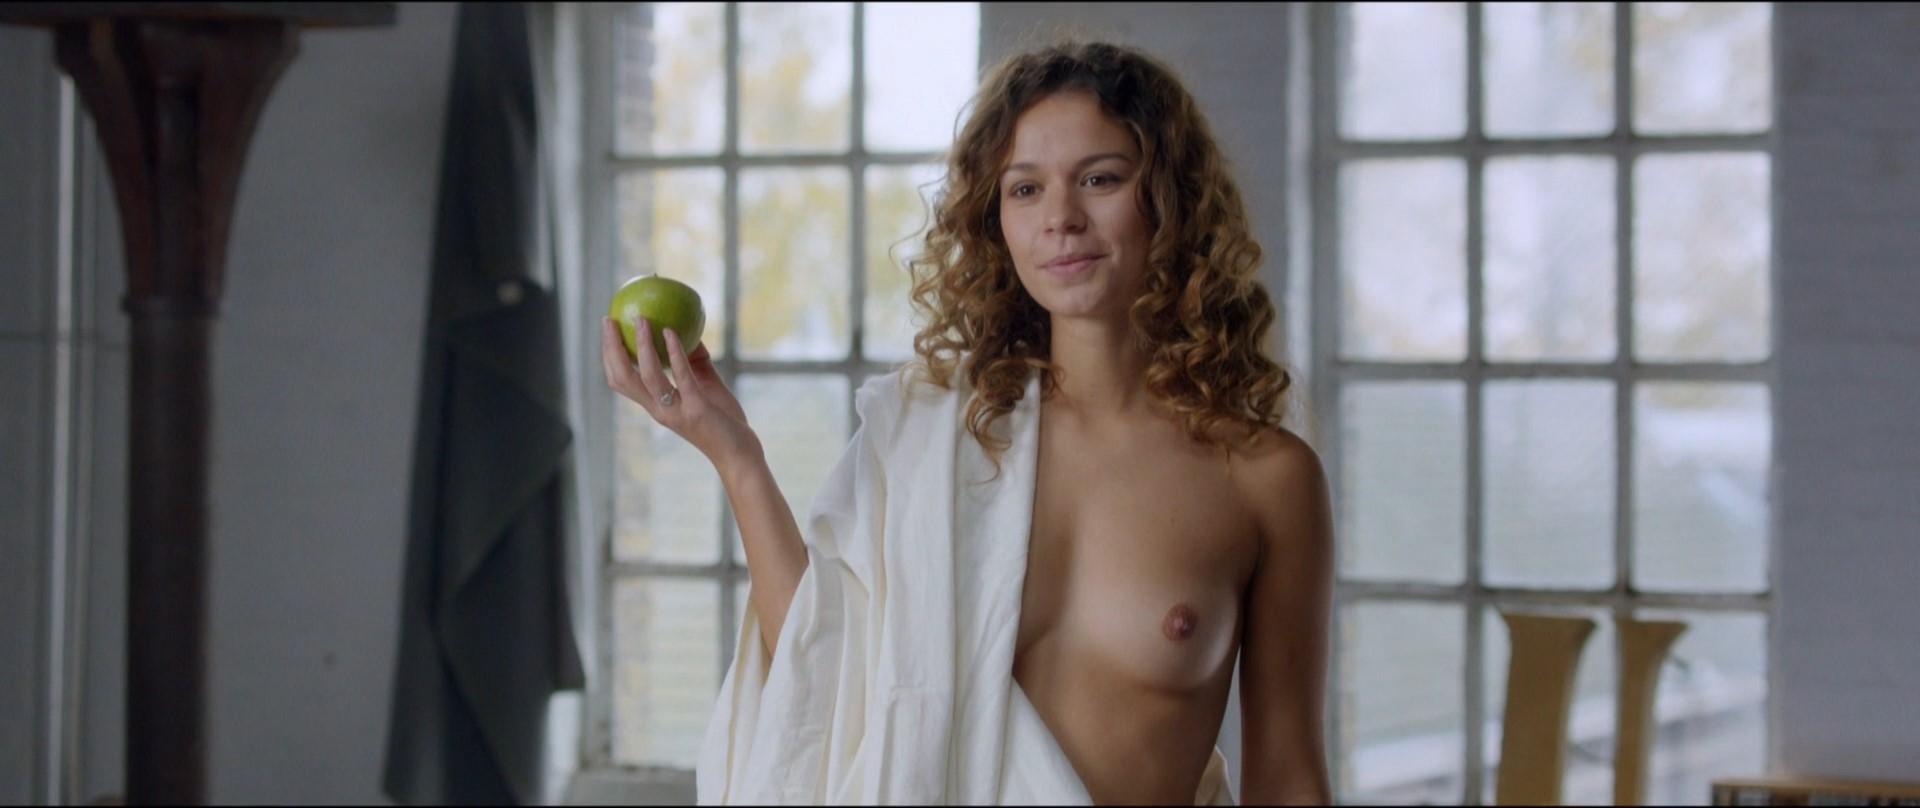 lisa wagener nackt